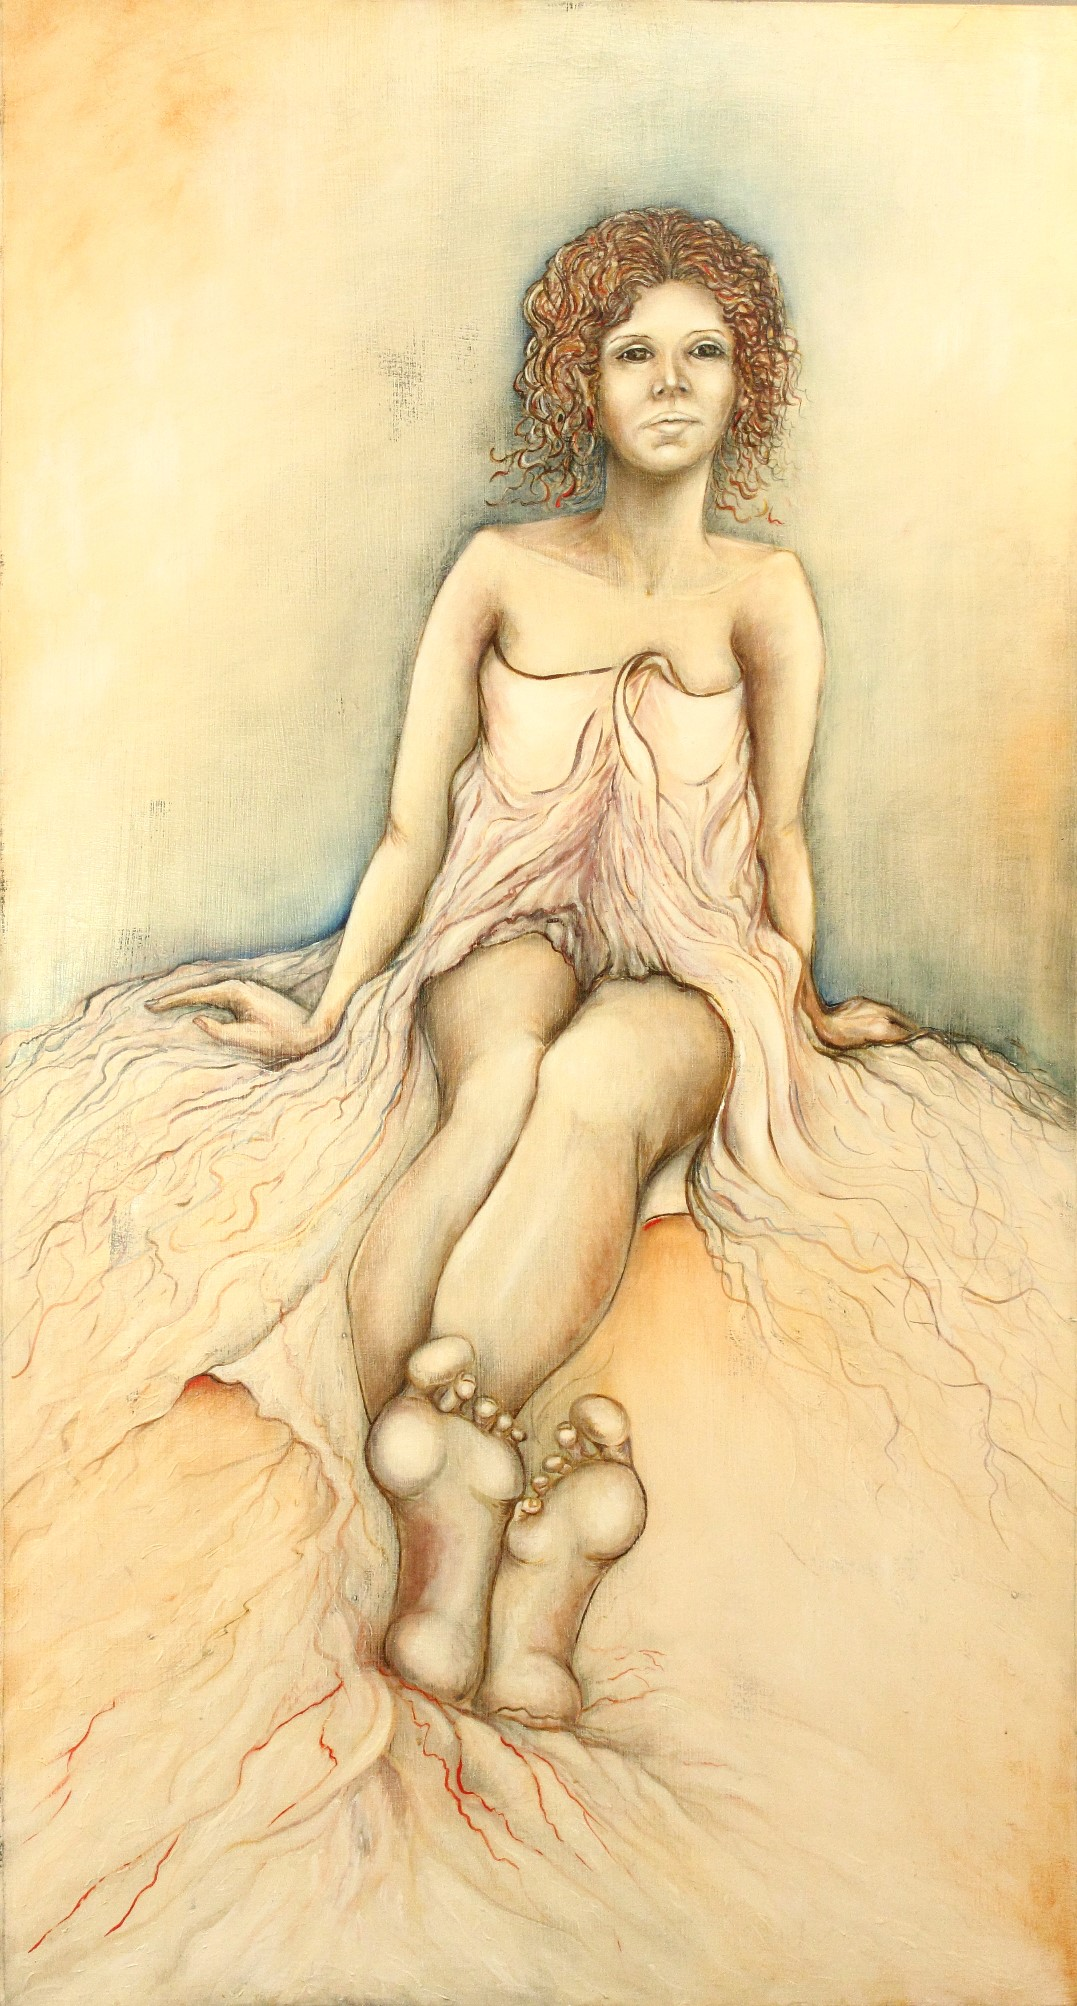 Blanca patona